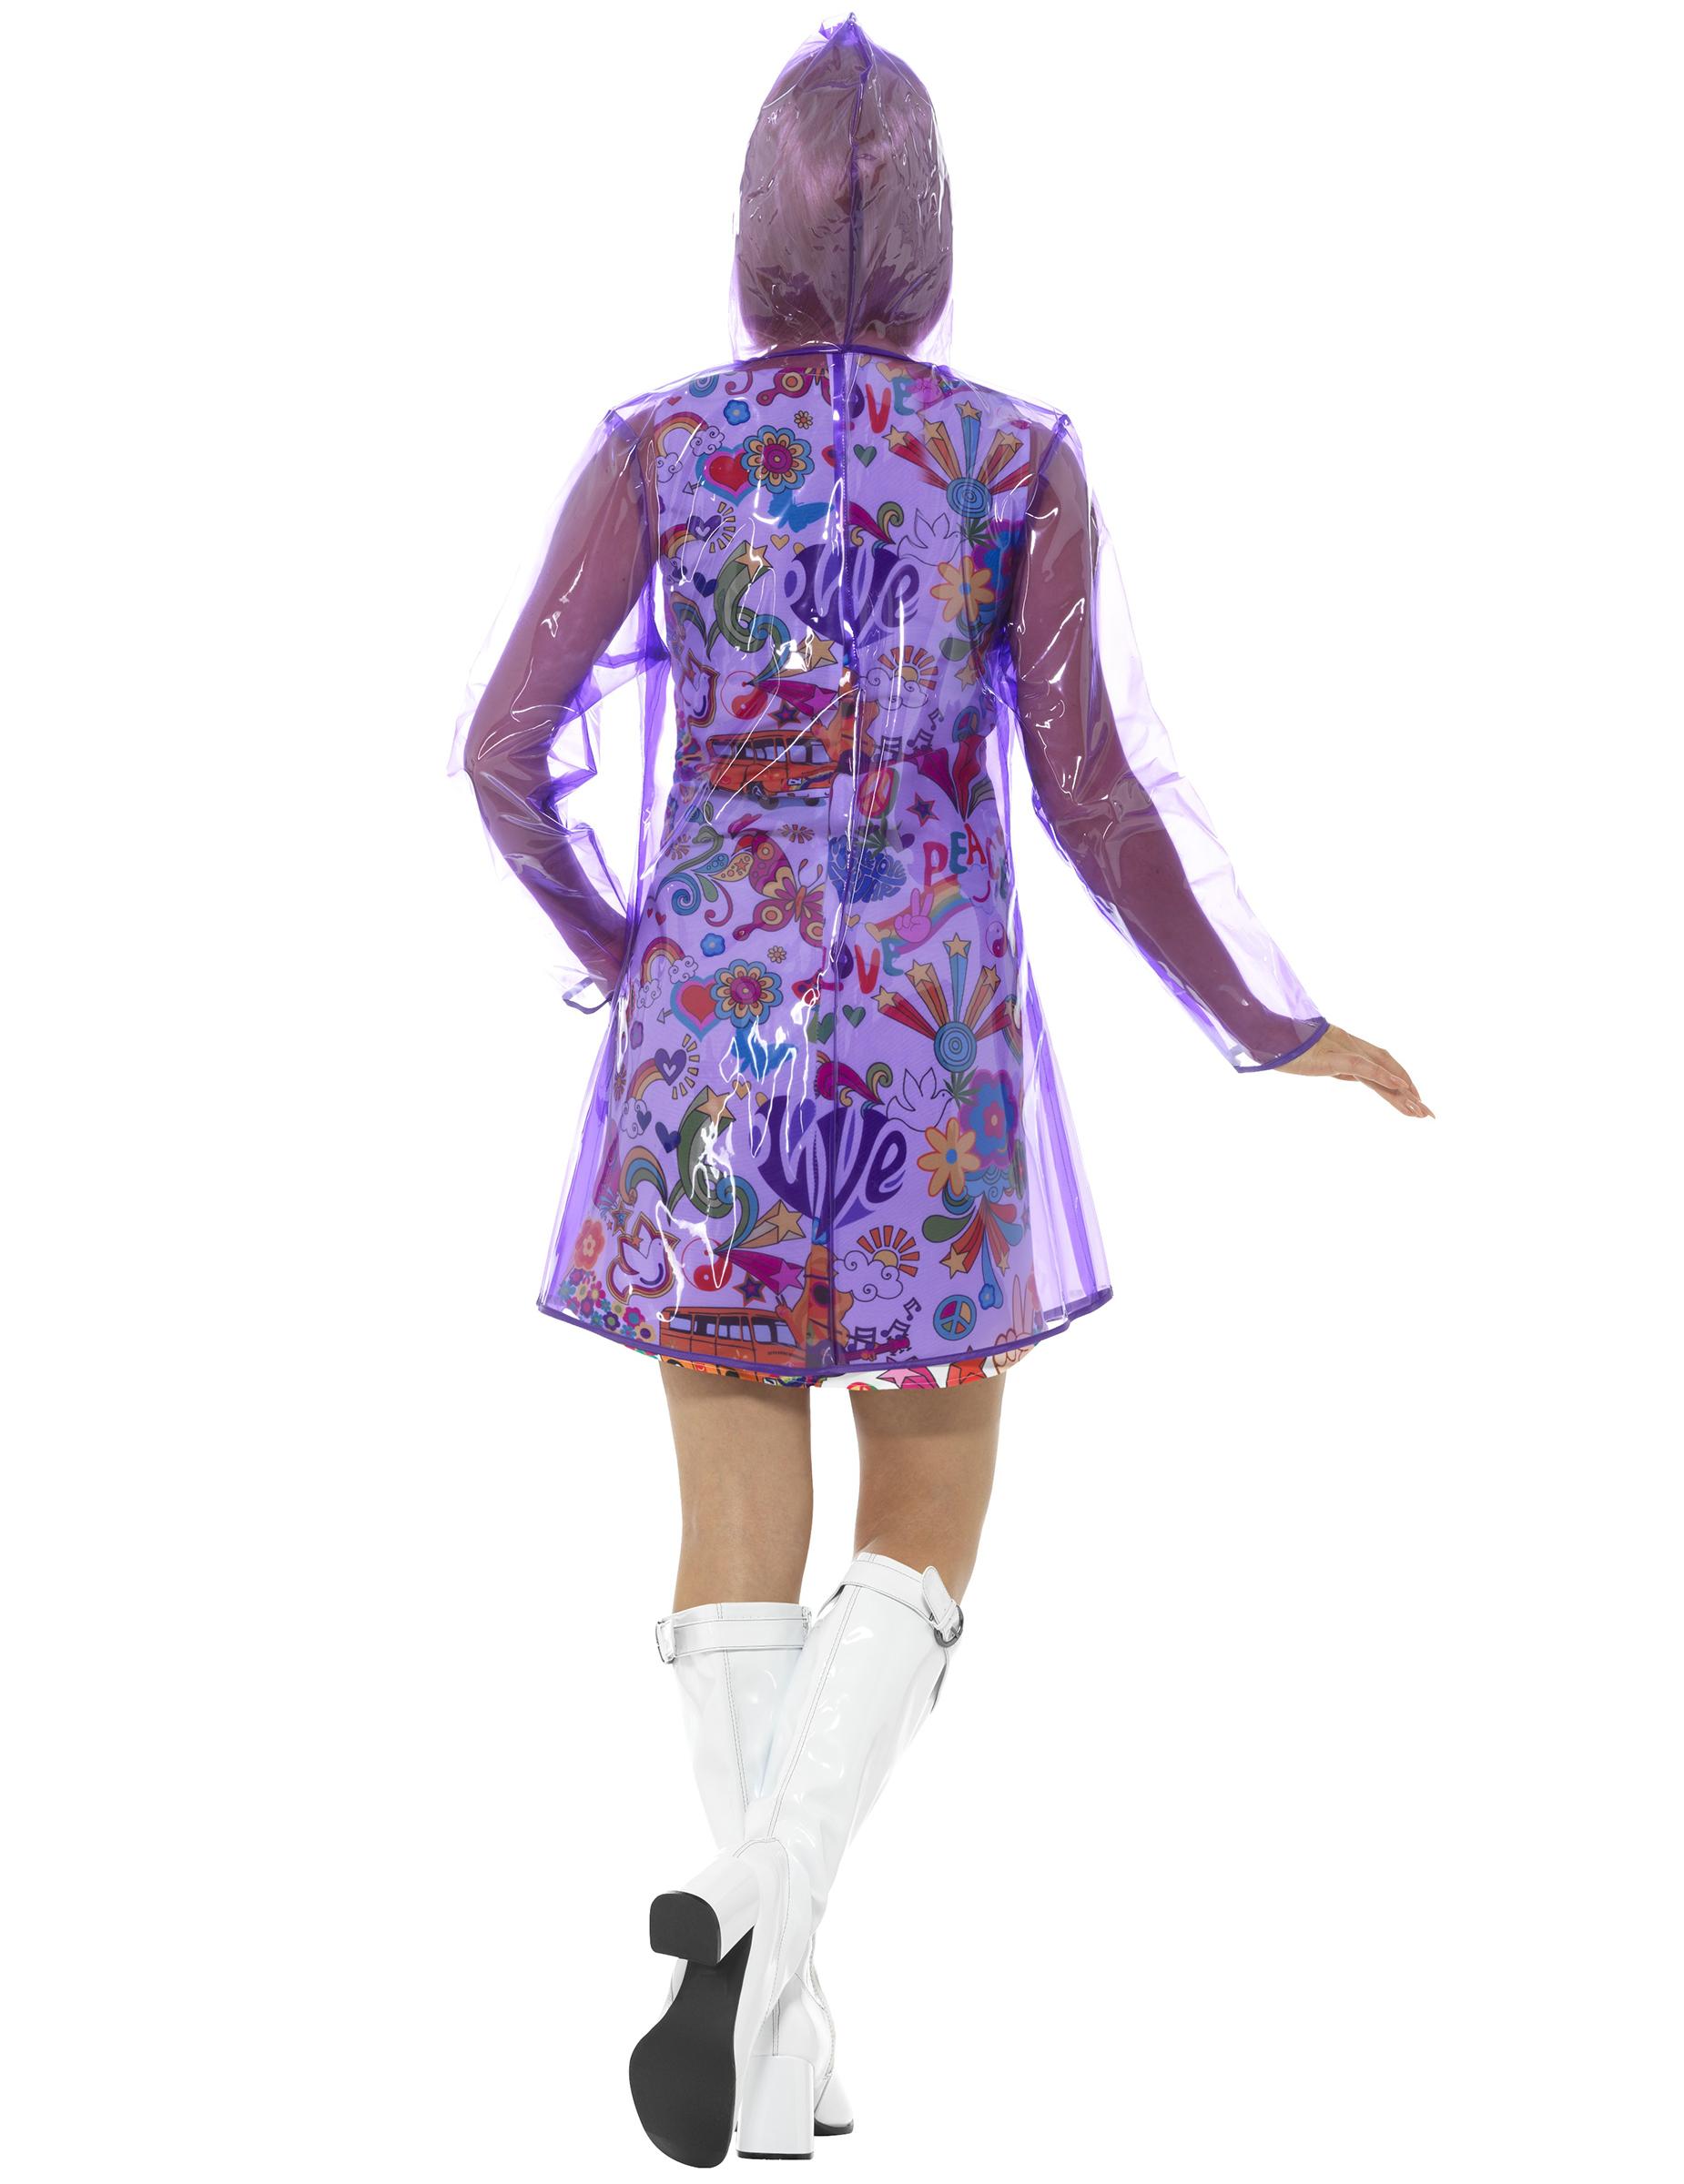 wasserdichte jacke 60er jahre violett damen kost me f r. Black Bedroom Furniture Sets. Home Design Ideas